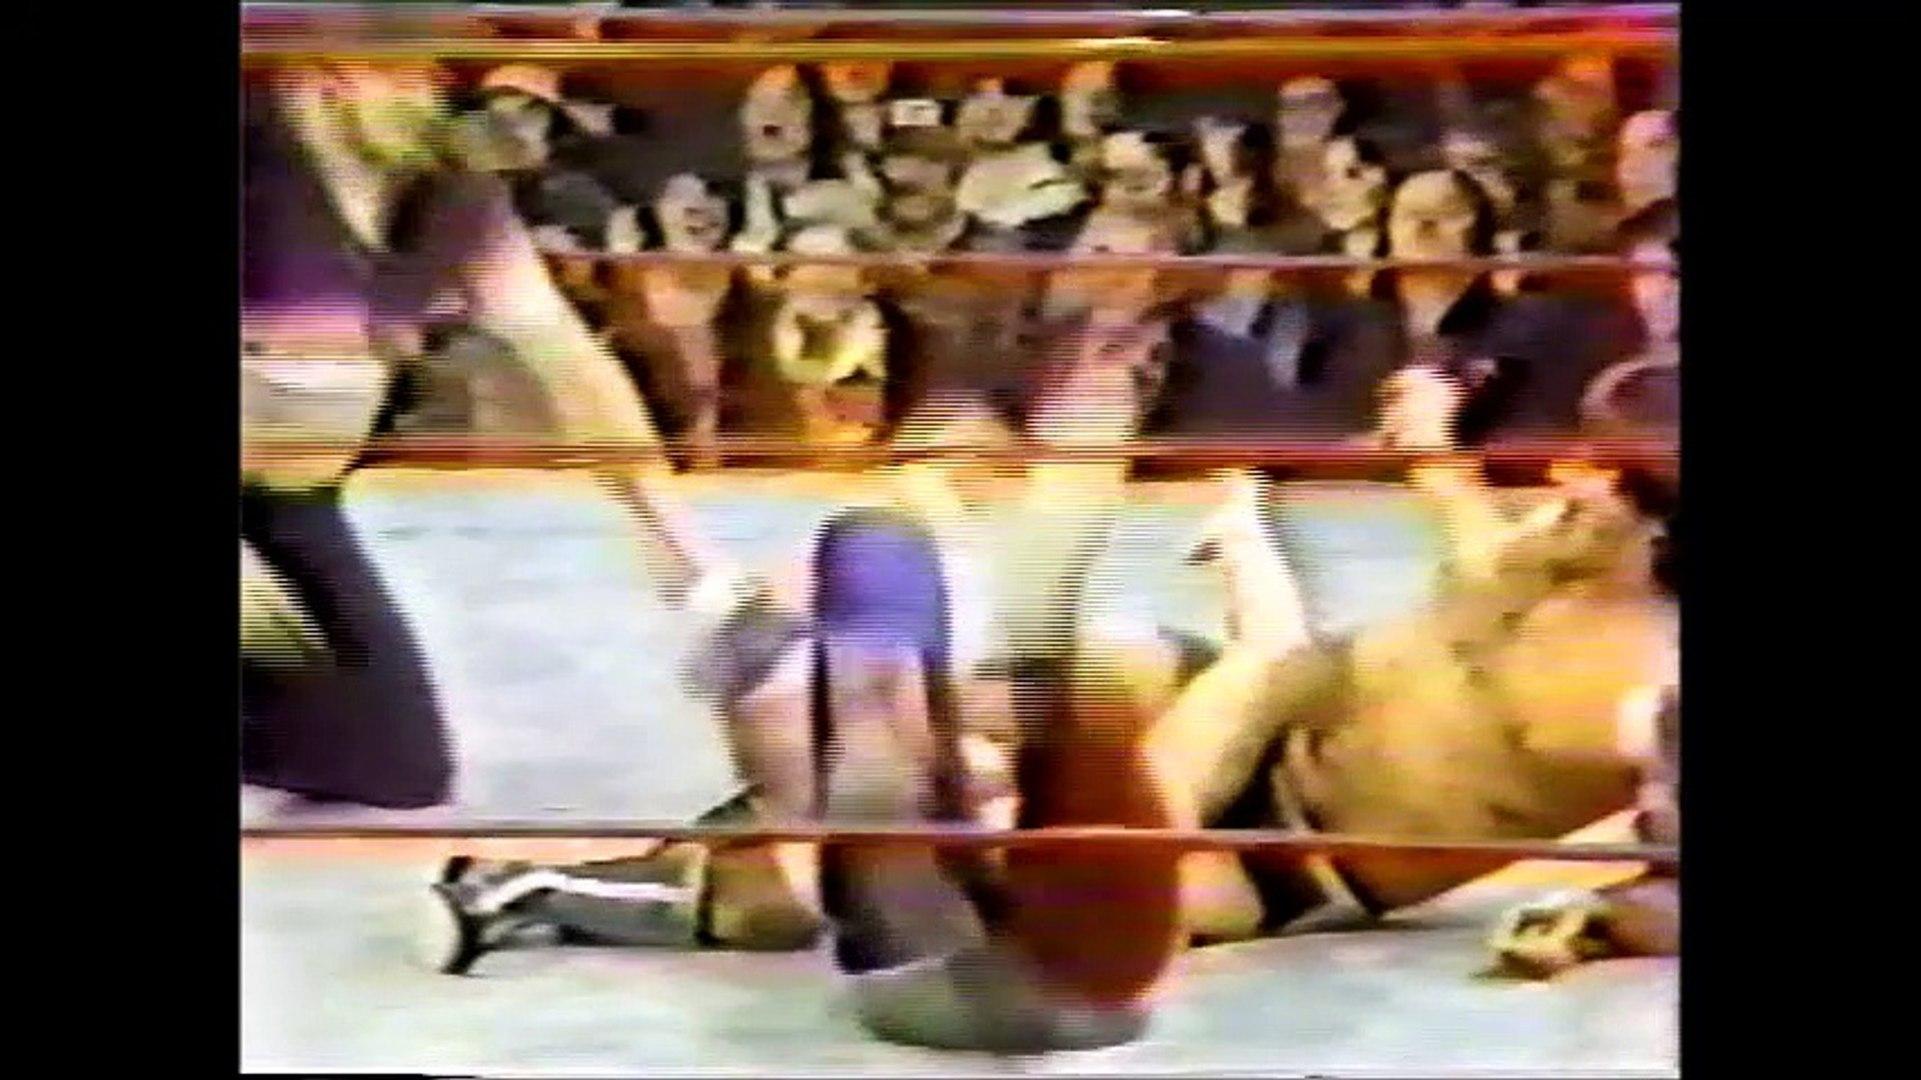 Roddy Piper/Rick Martel vs New Zealand Sheepherders (Portland 1980)